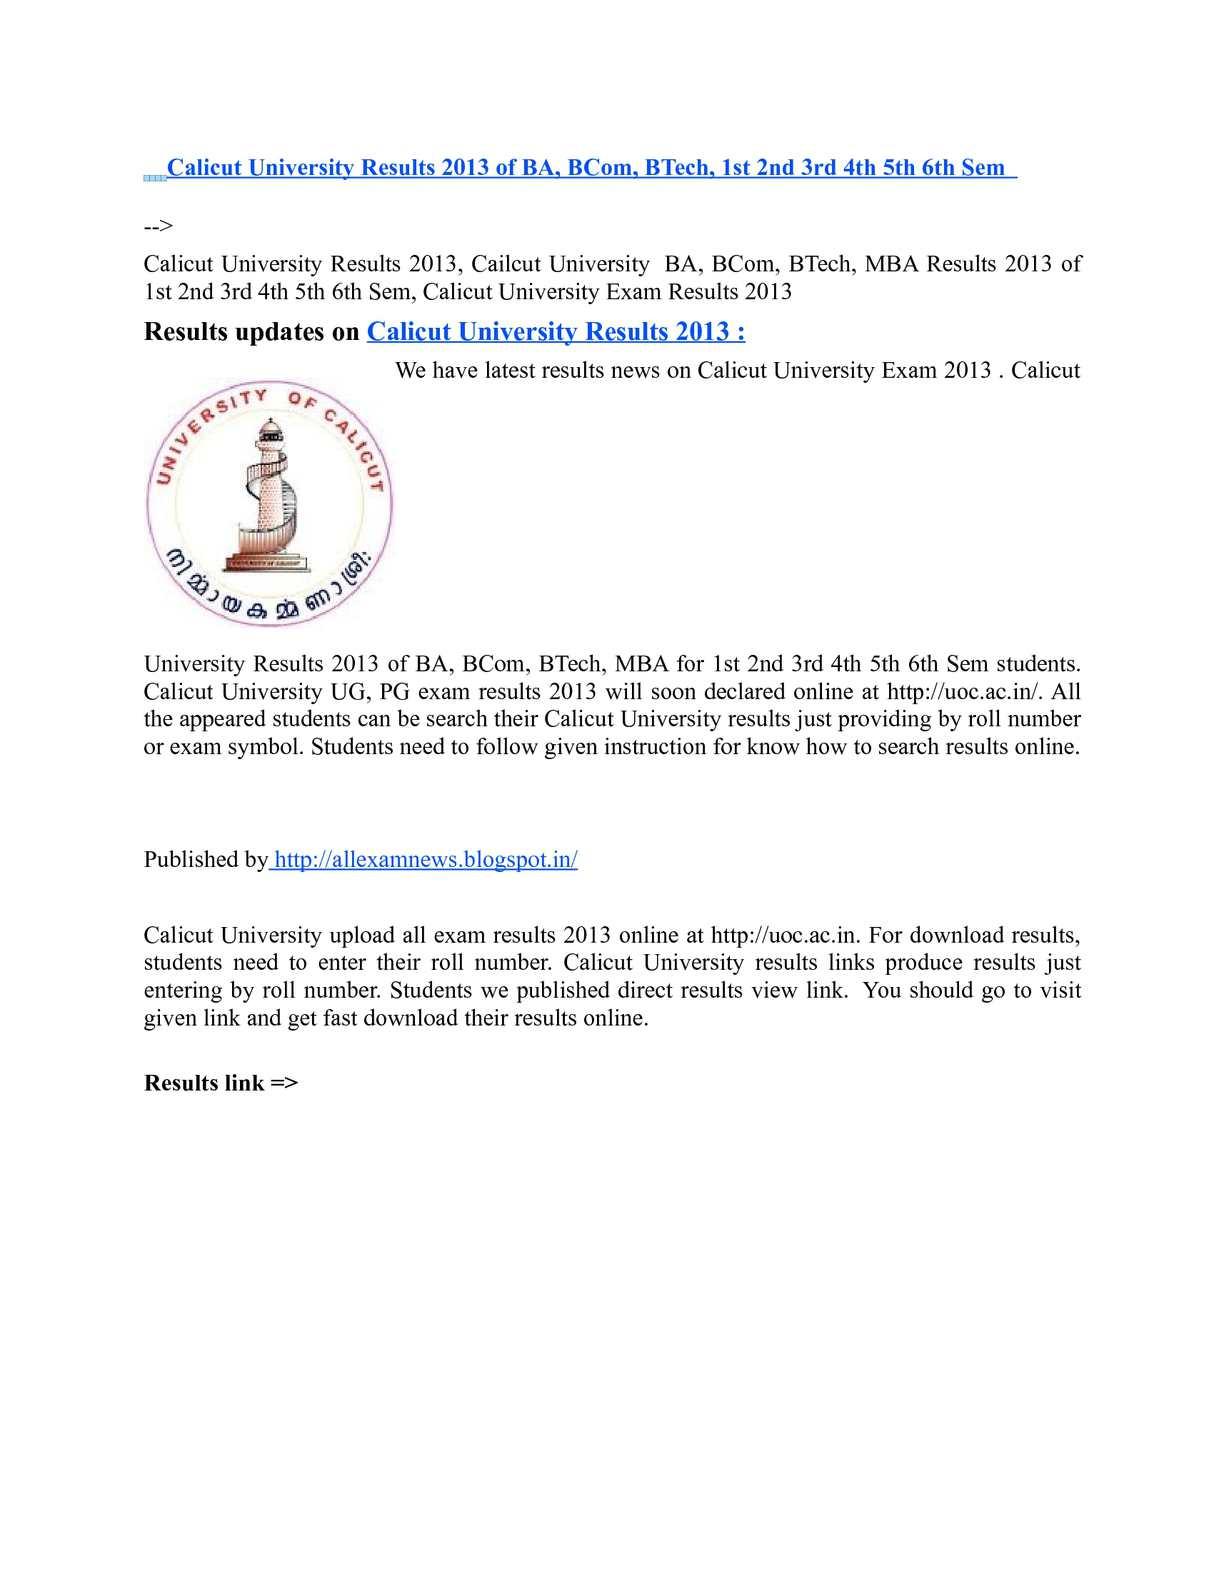 Calaméo - Calicut University Results 2013 of BA, BCom, BTech, 1st